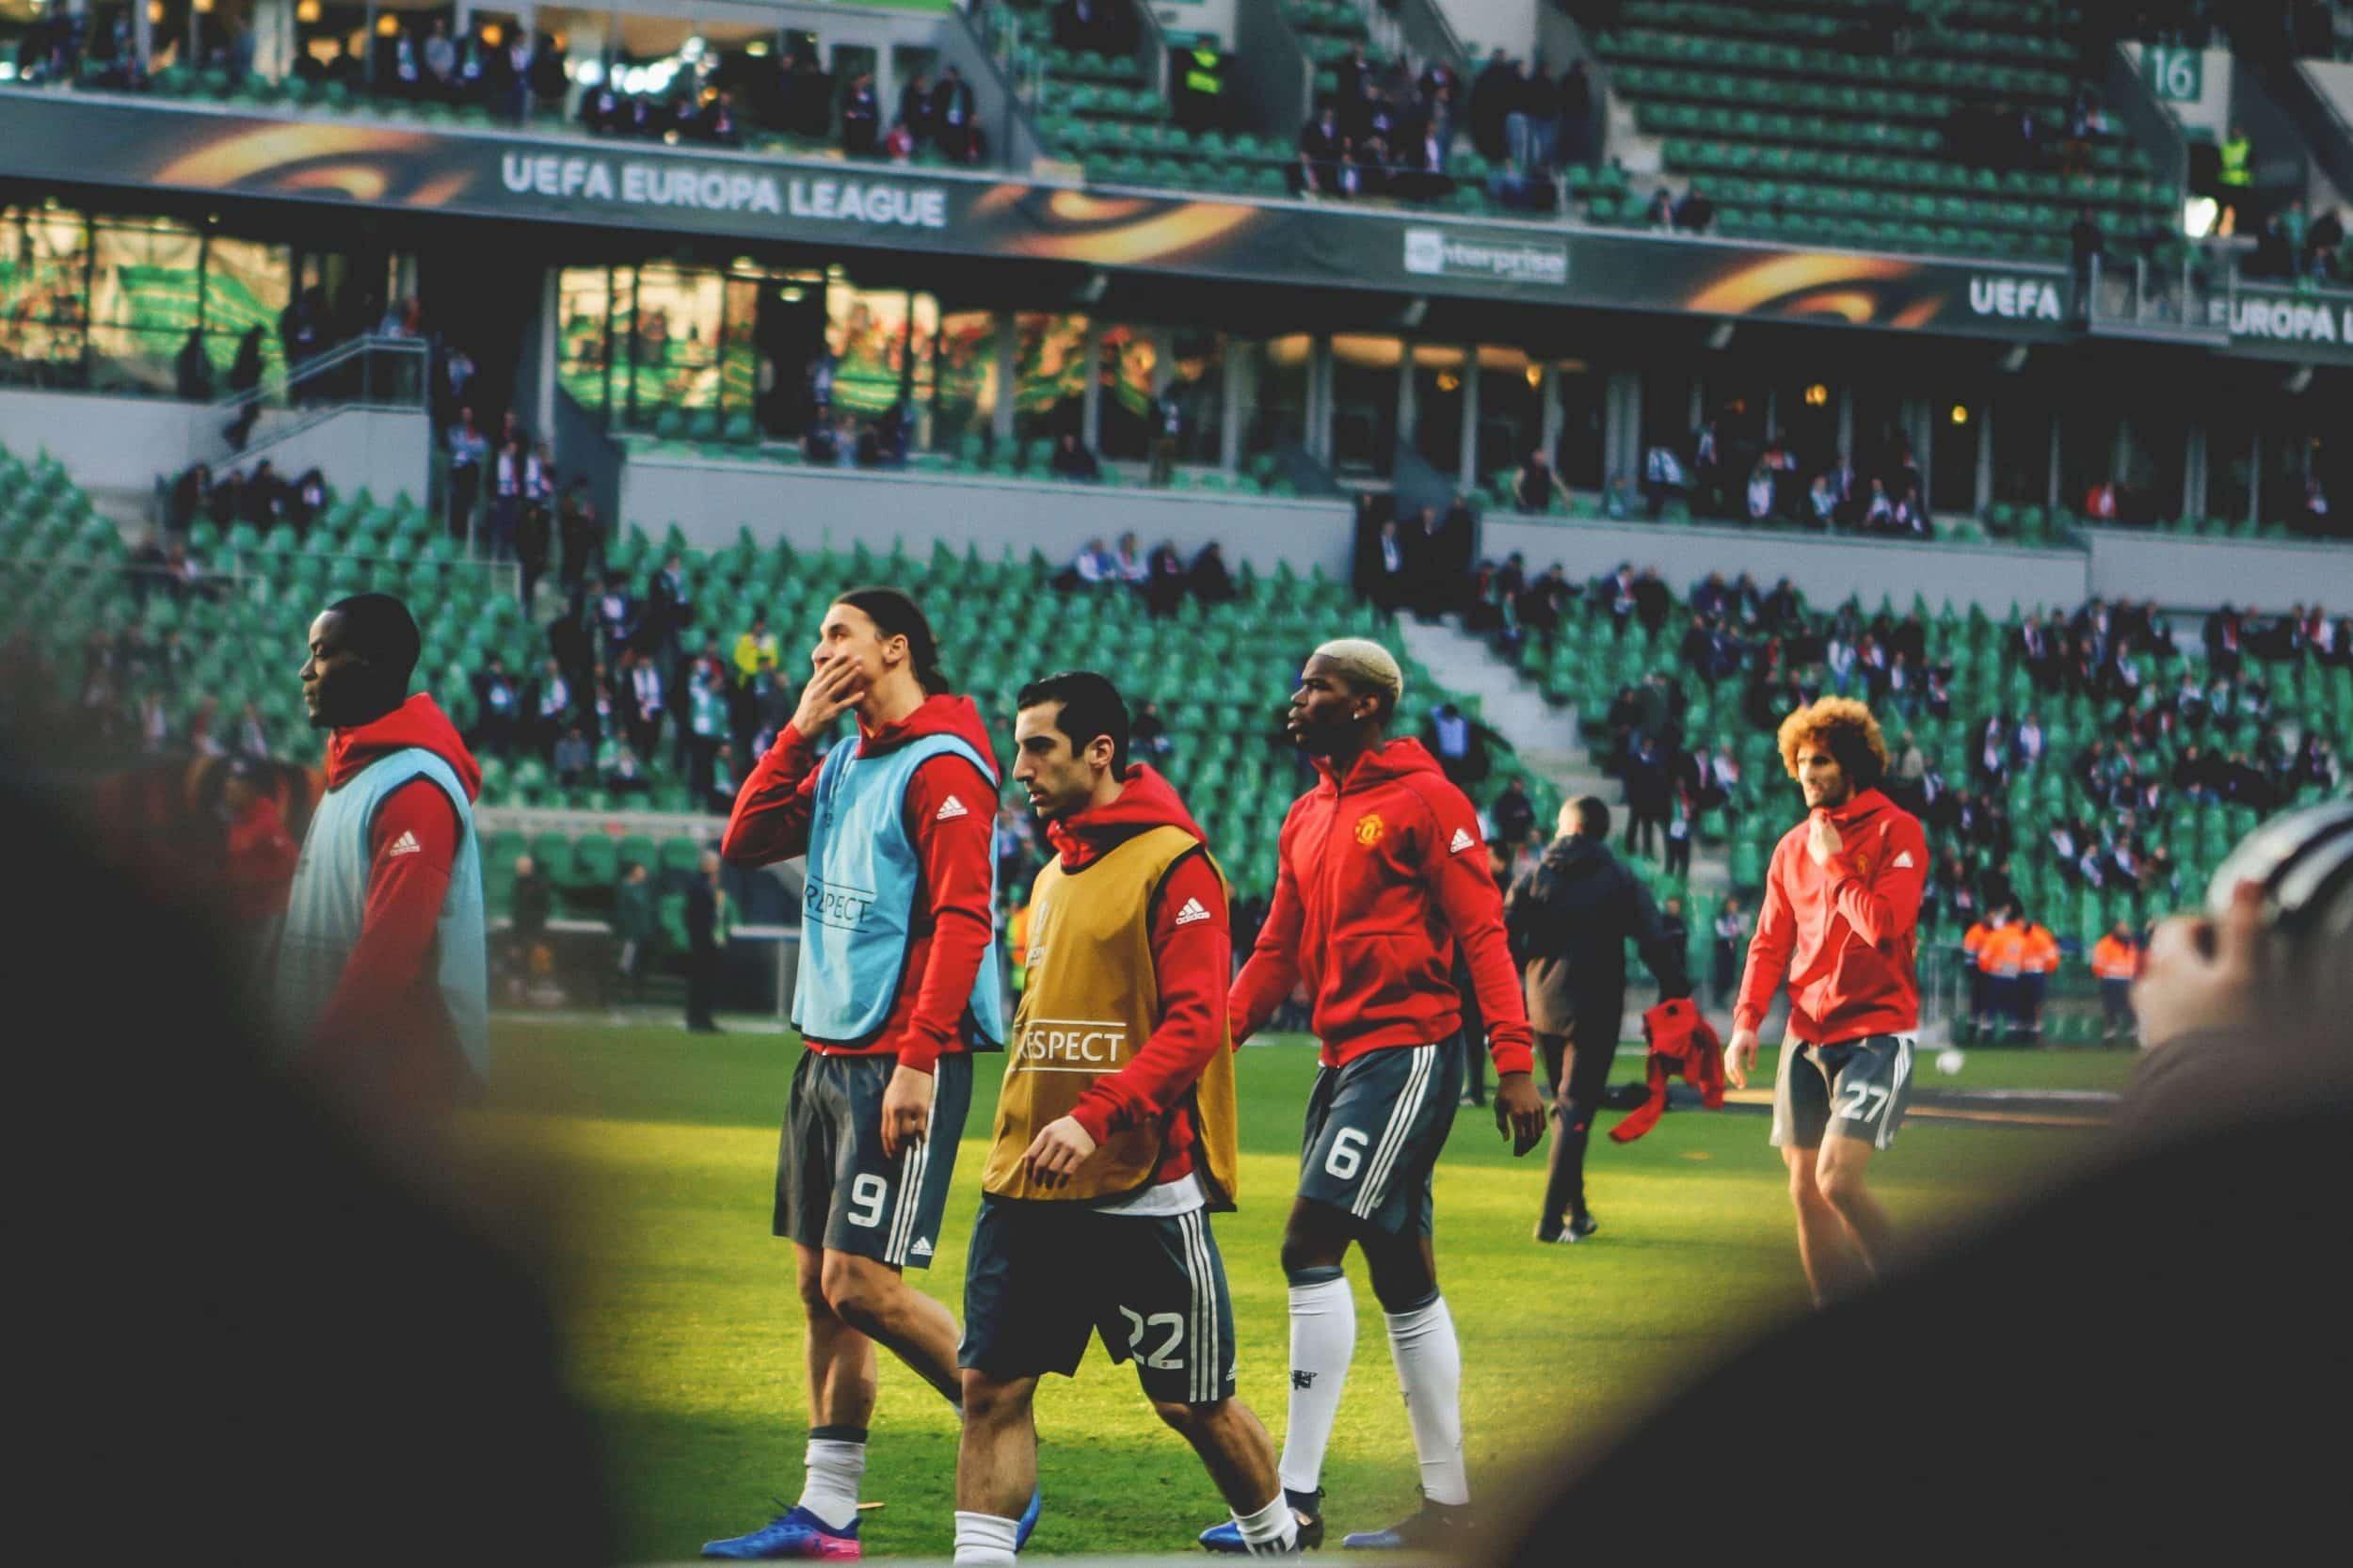 au-stade-geoffroy-guichard-asse-manchester-united-europa-league-15-min